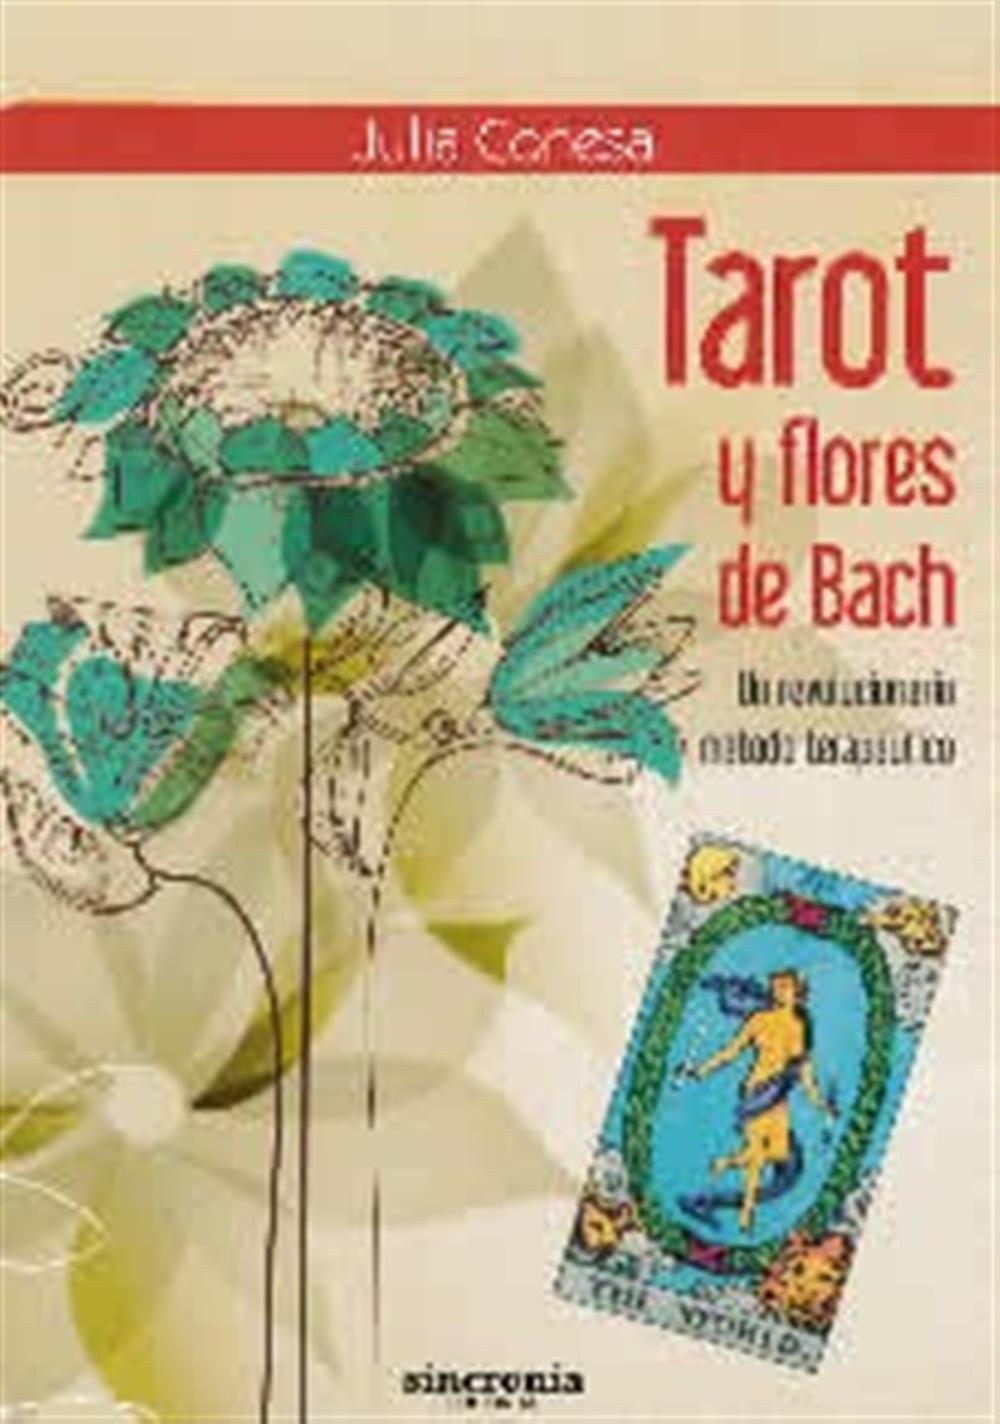 Tarot y flores de Bach